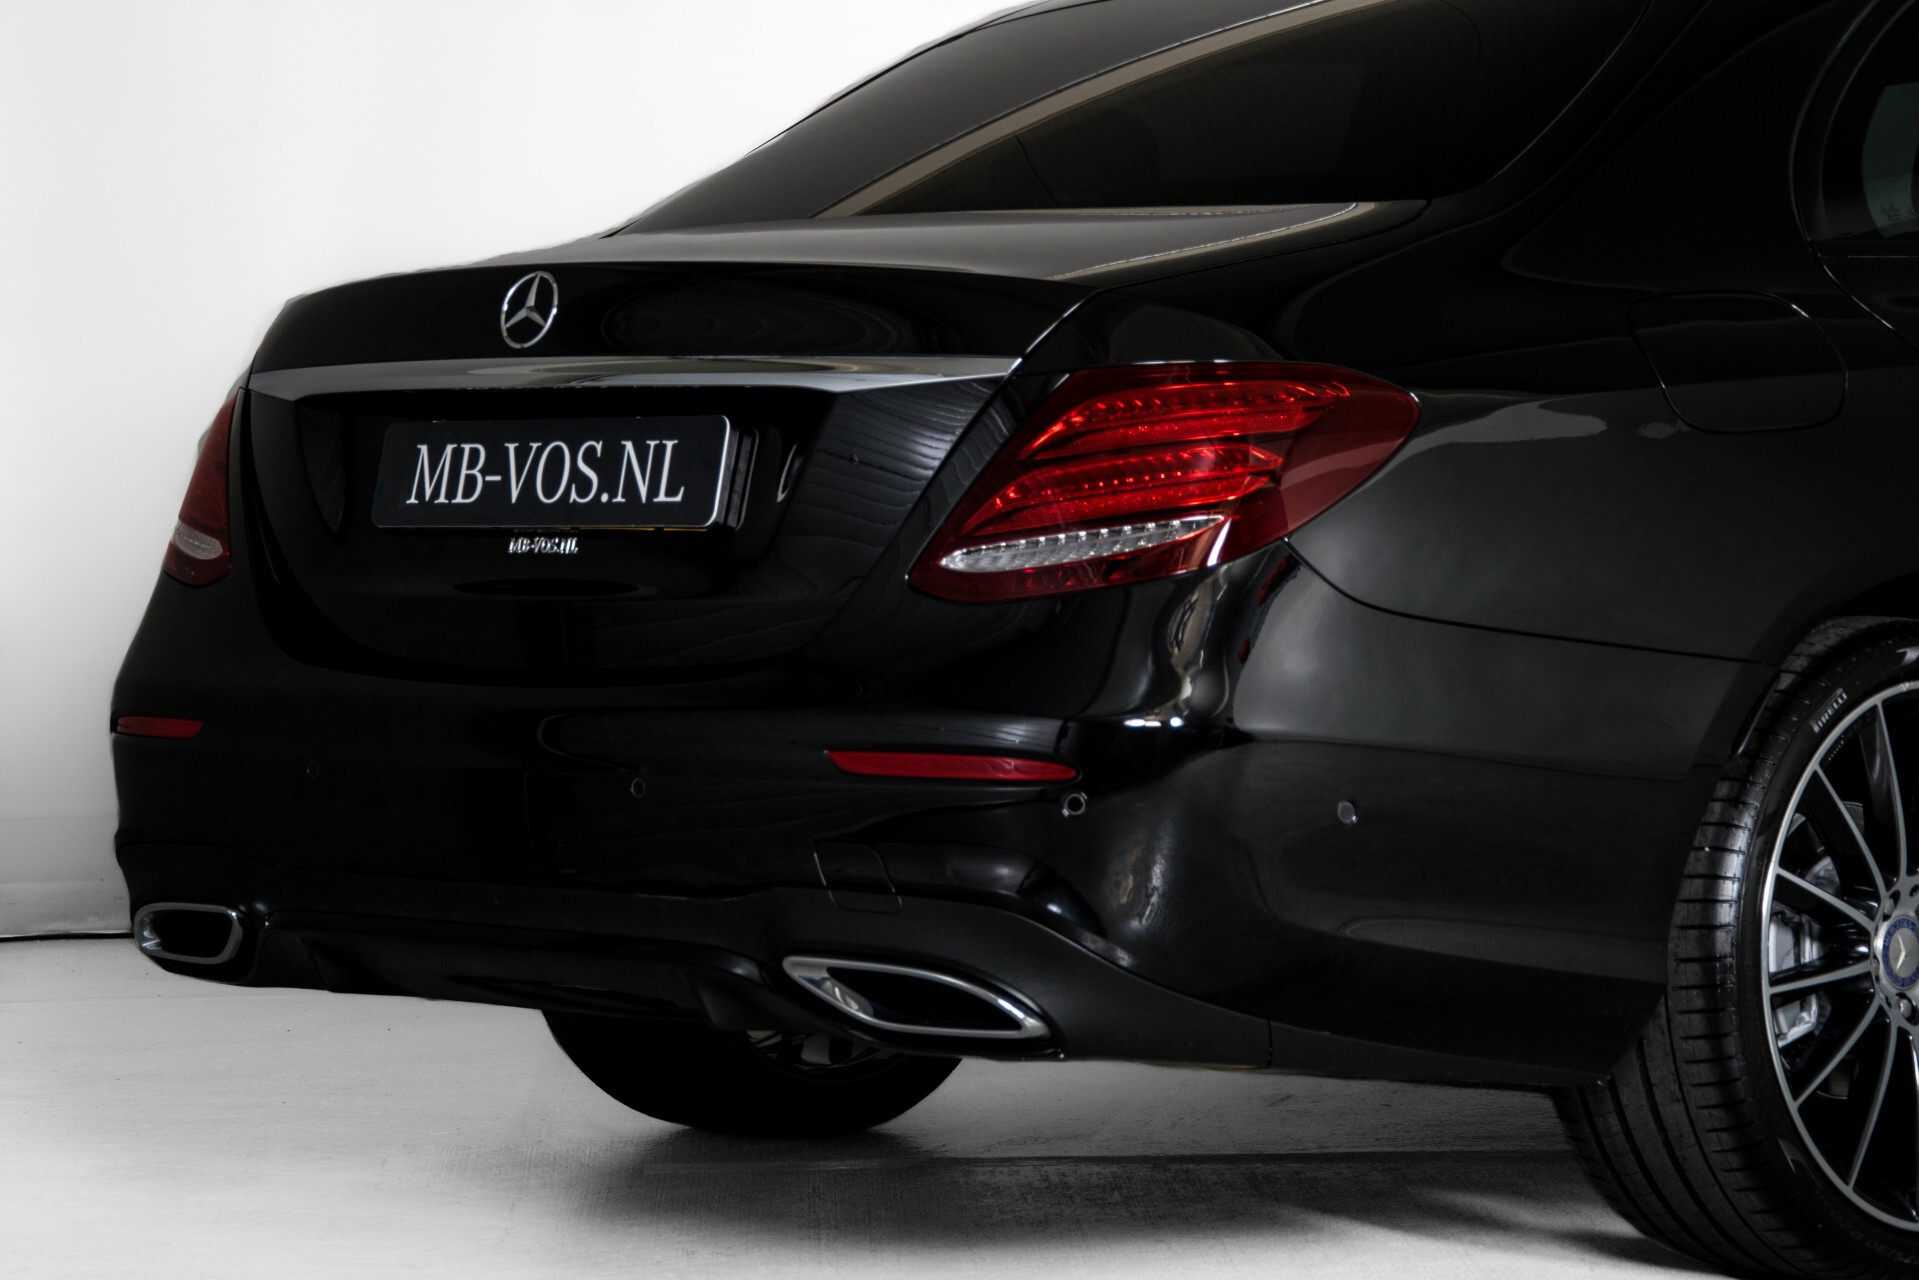 "Mercedes-Benz E-Klasse 220 d AMG Night Panorama/Widescreen/Burmester/20""/Wegklapbare trekhaak Aut9 Foto 58"